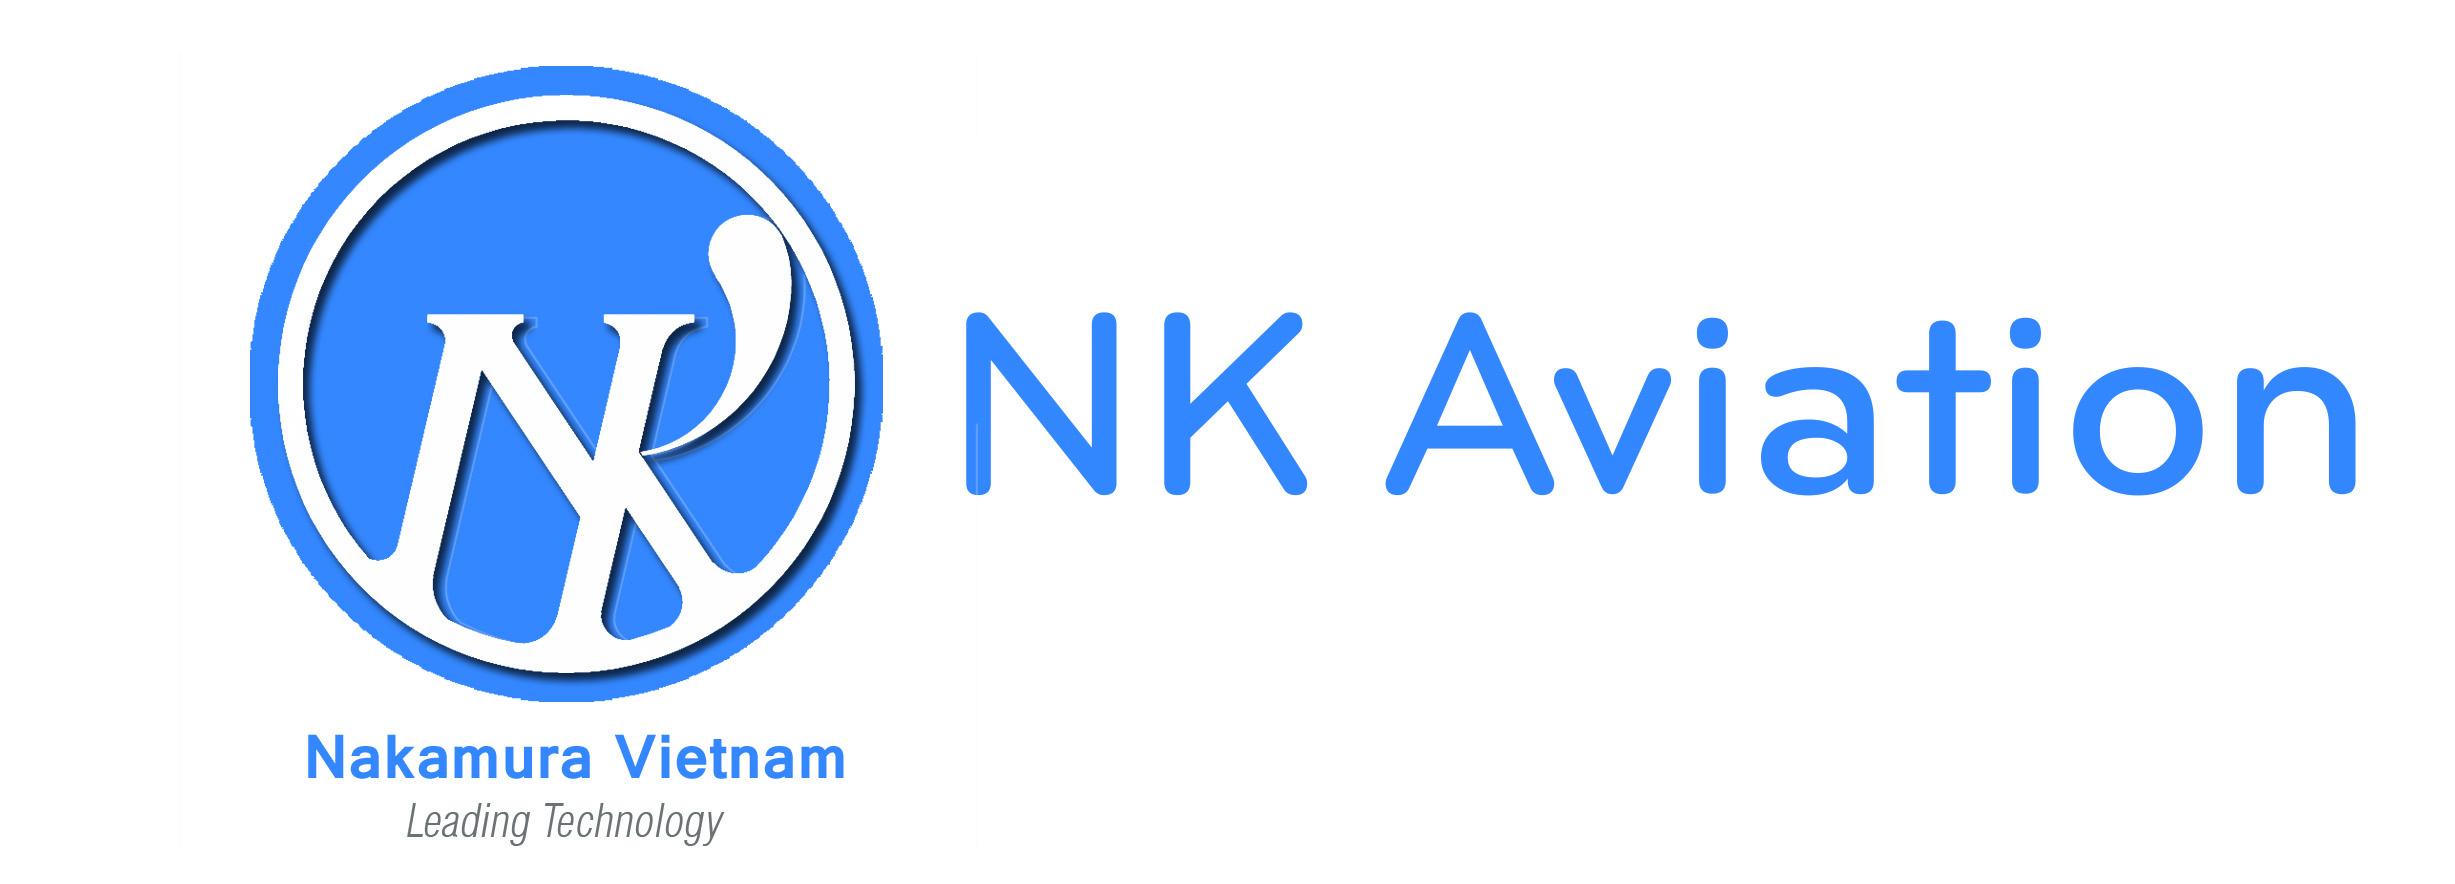 Logo nakamura